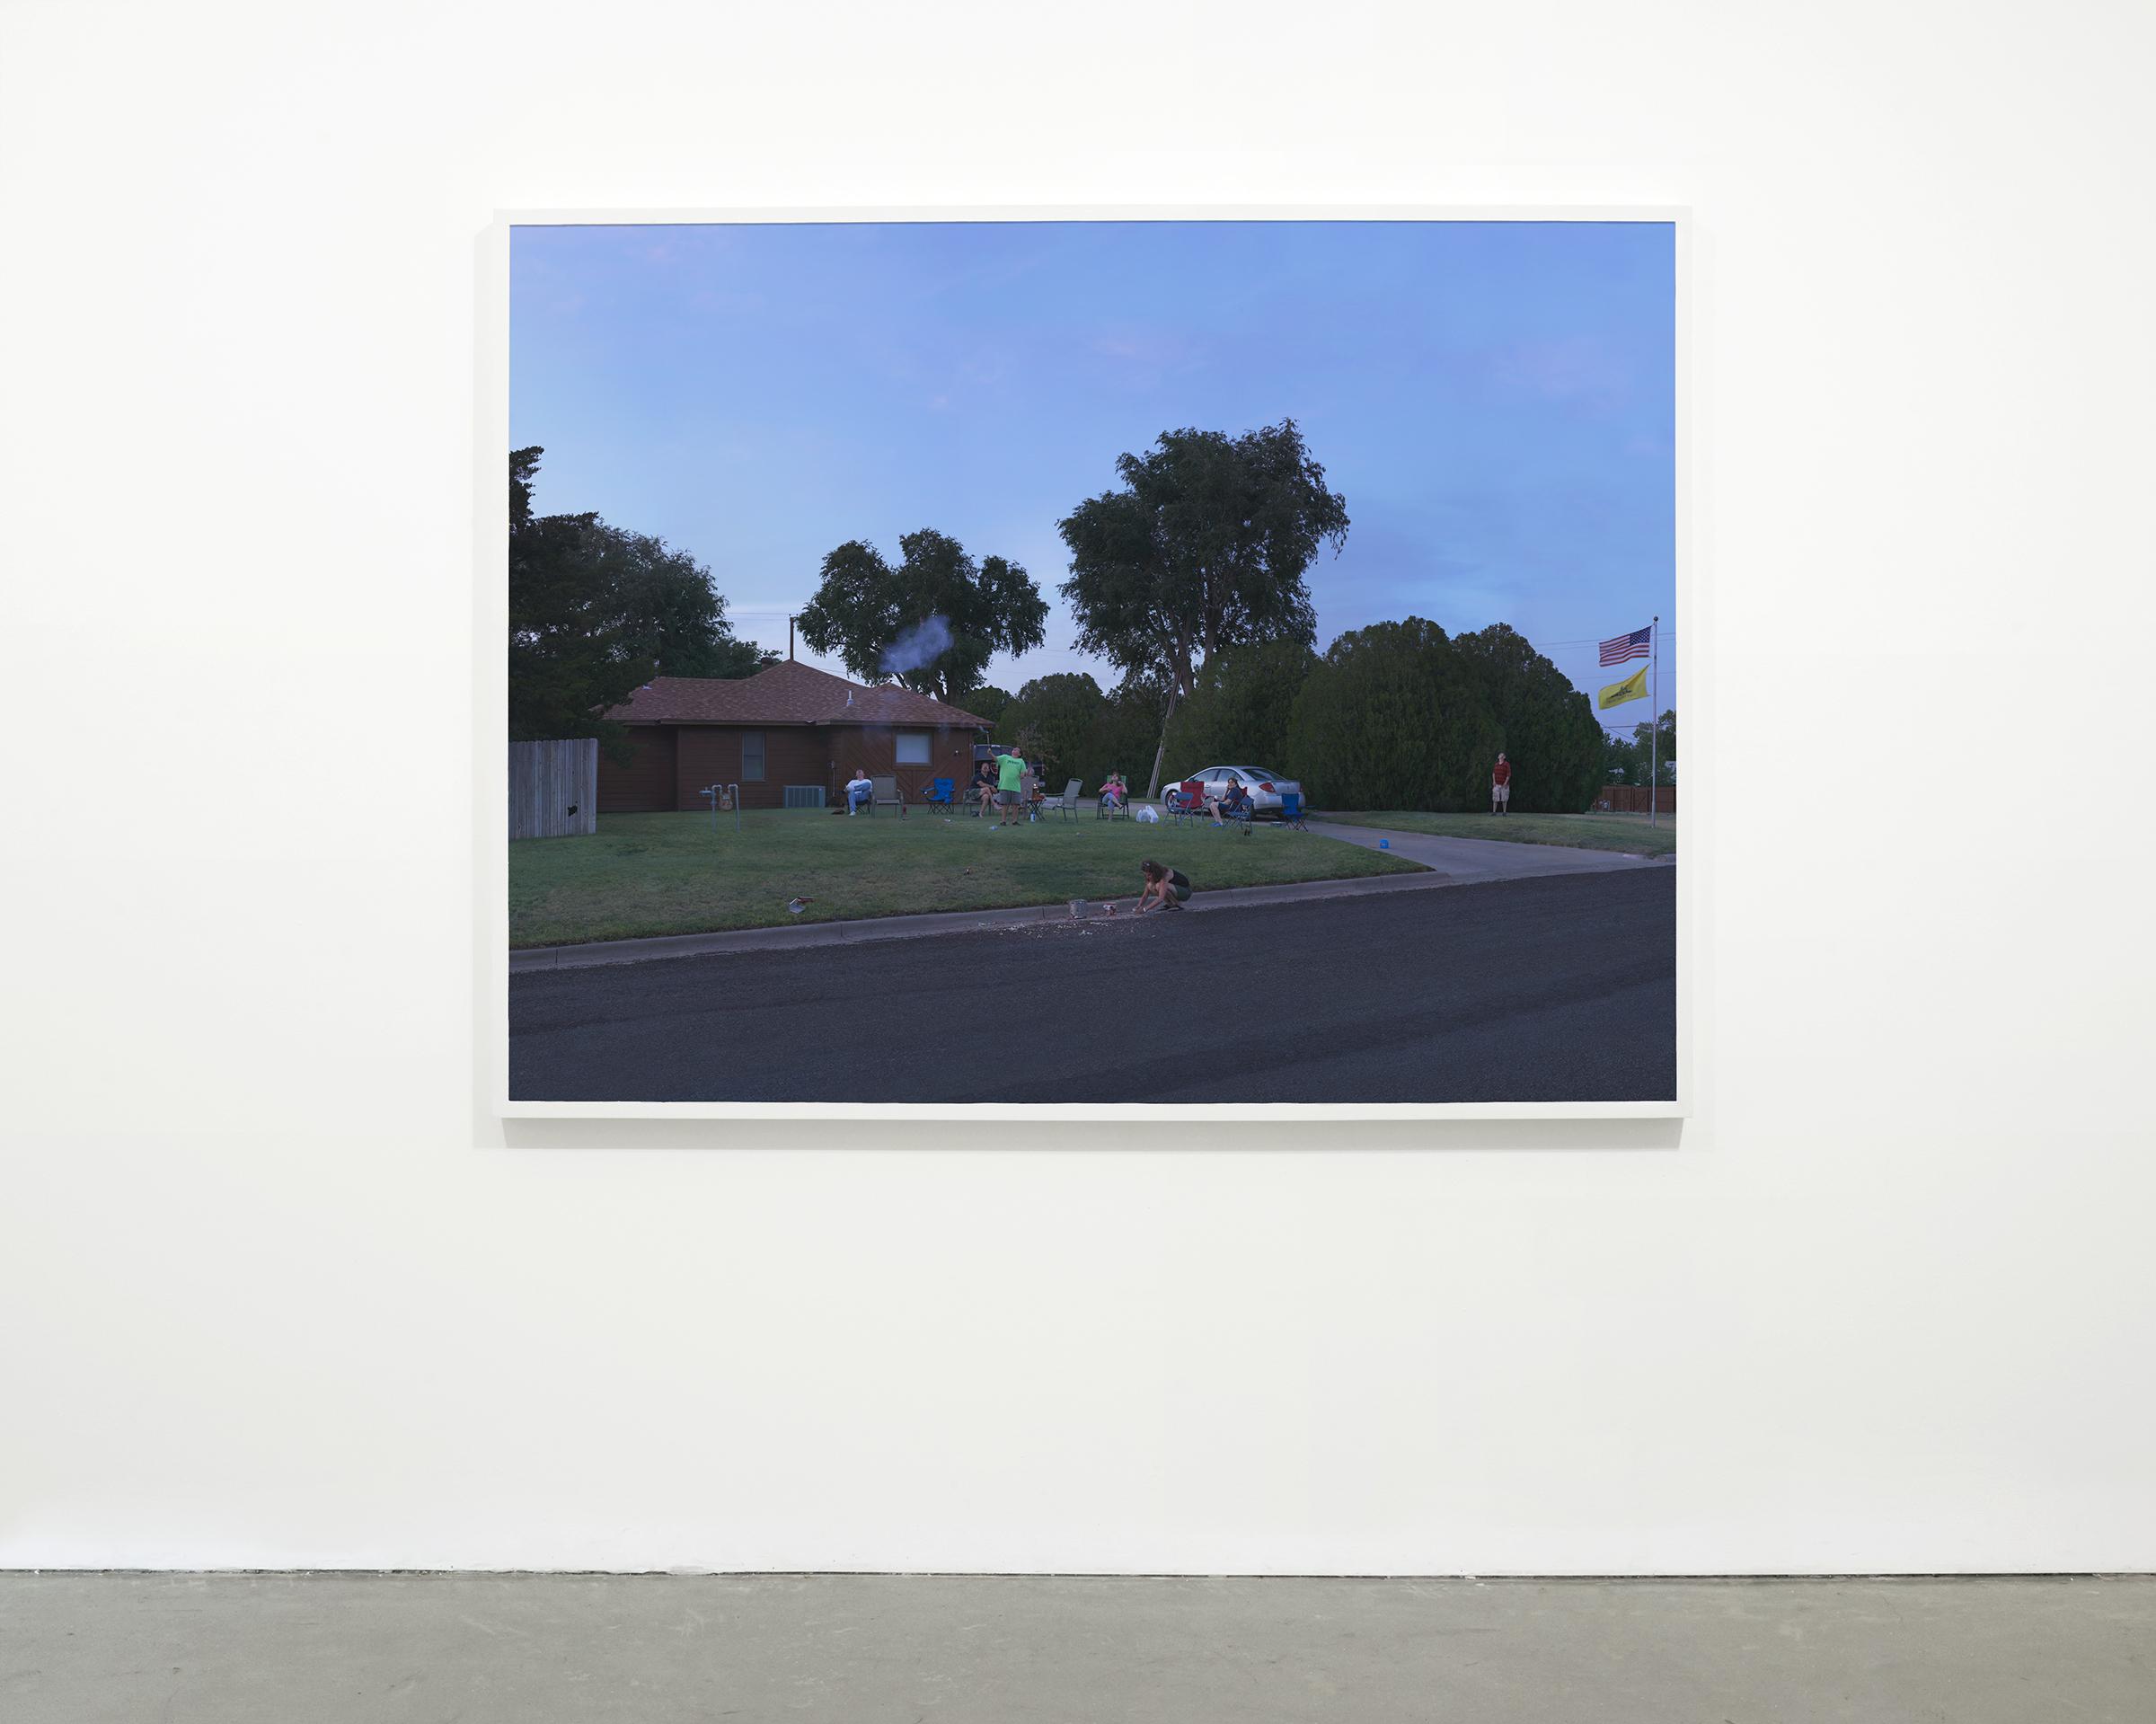 """July Fourth"", 2013 - 2015  54 x 72 in (137.15 x 182.88 cm)"